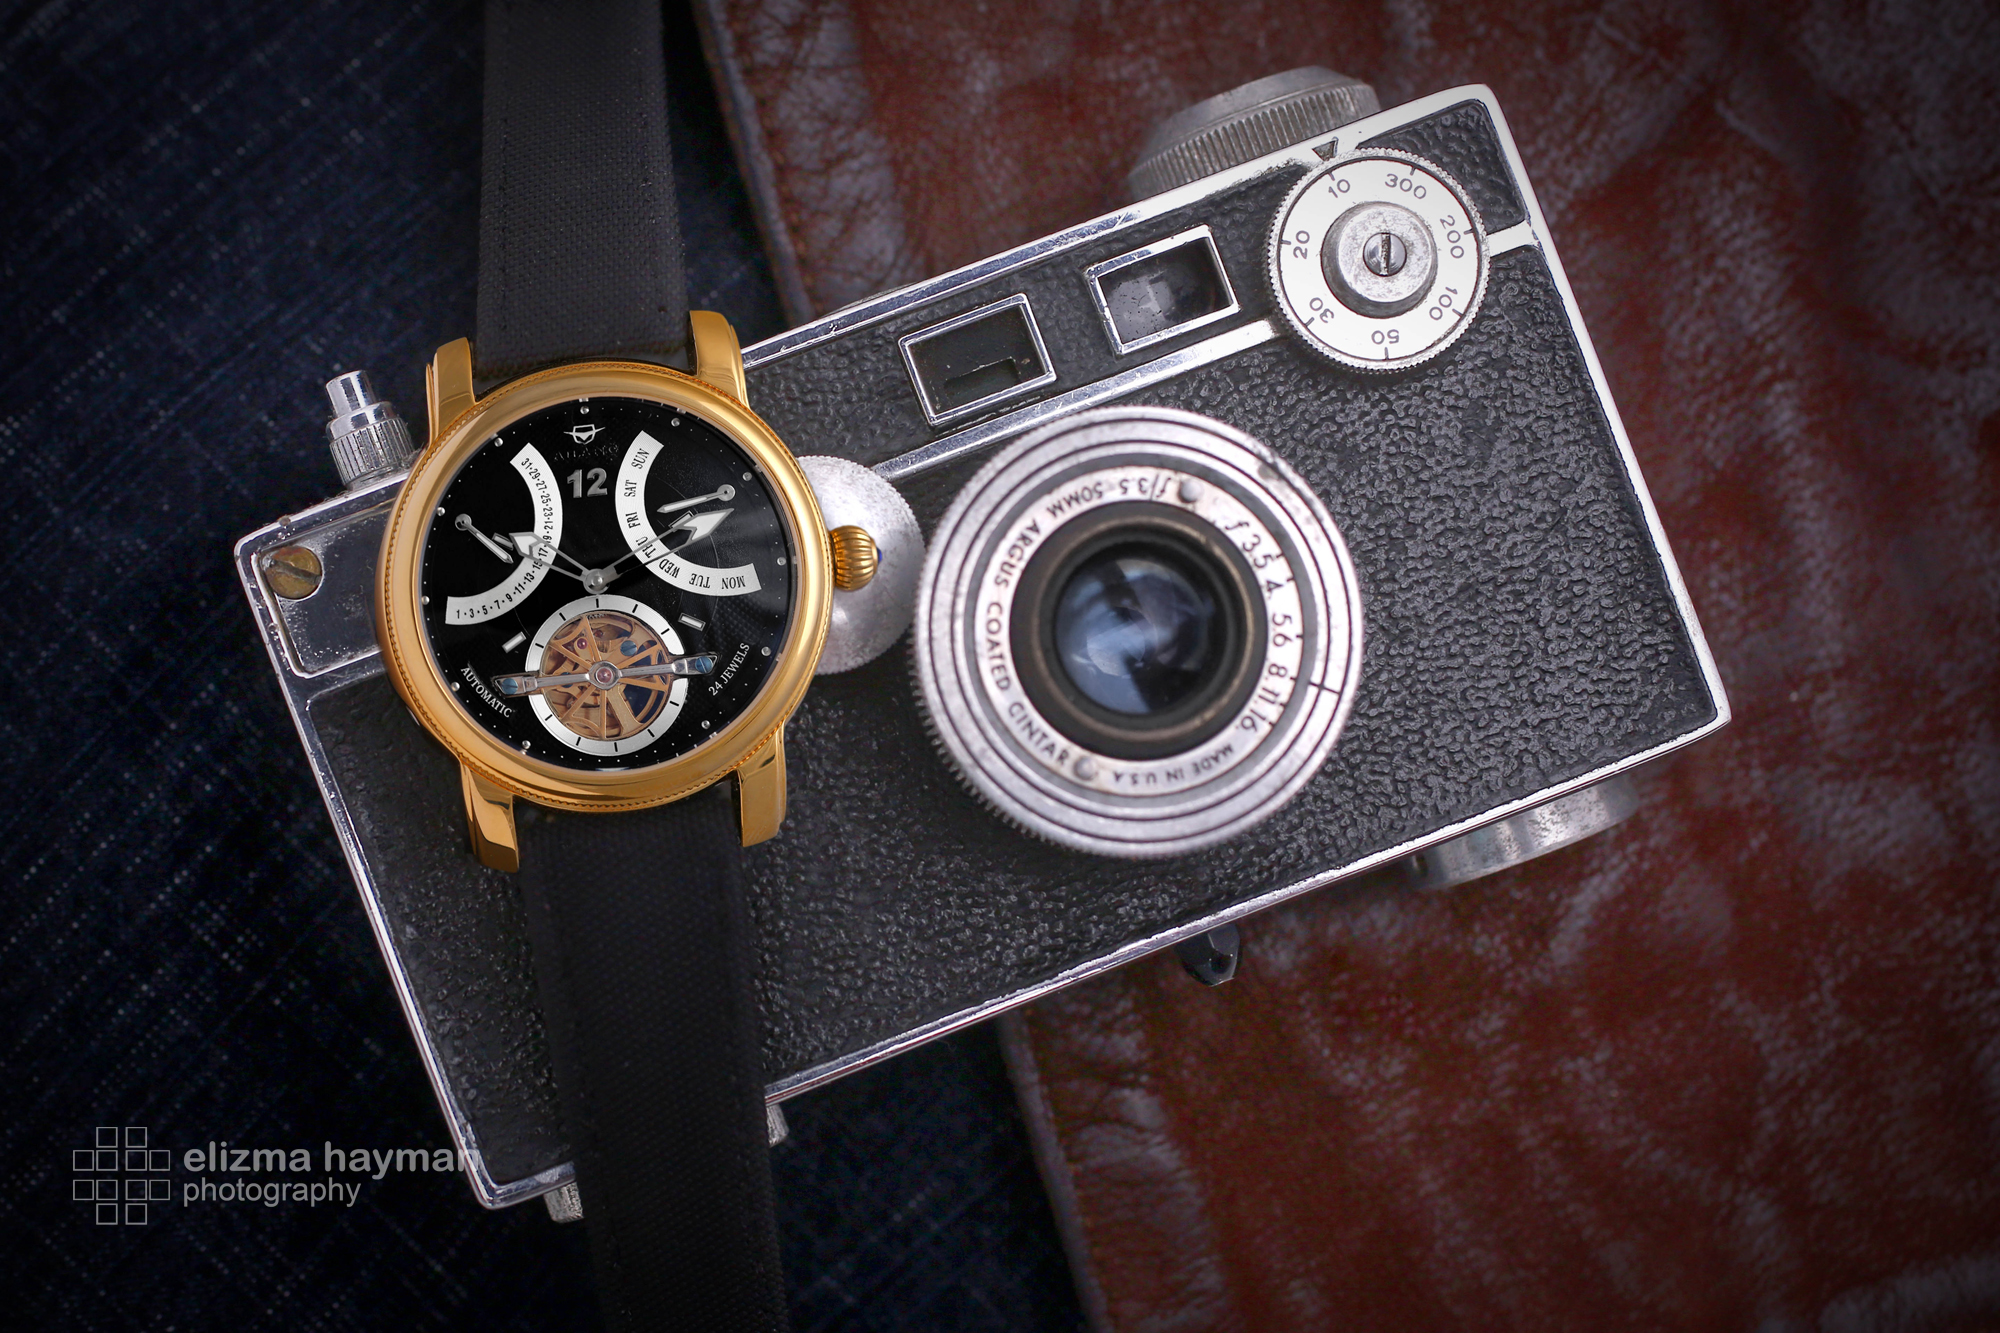 product photography elizma hayman